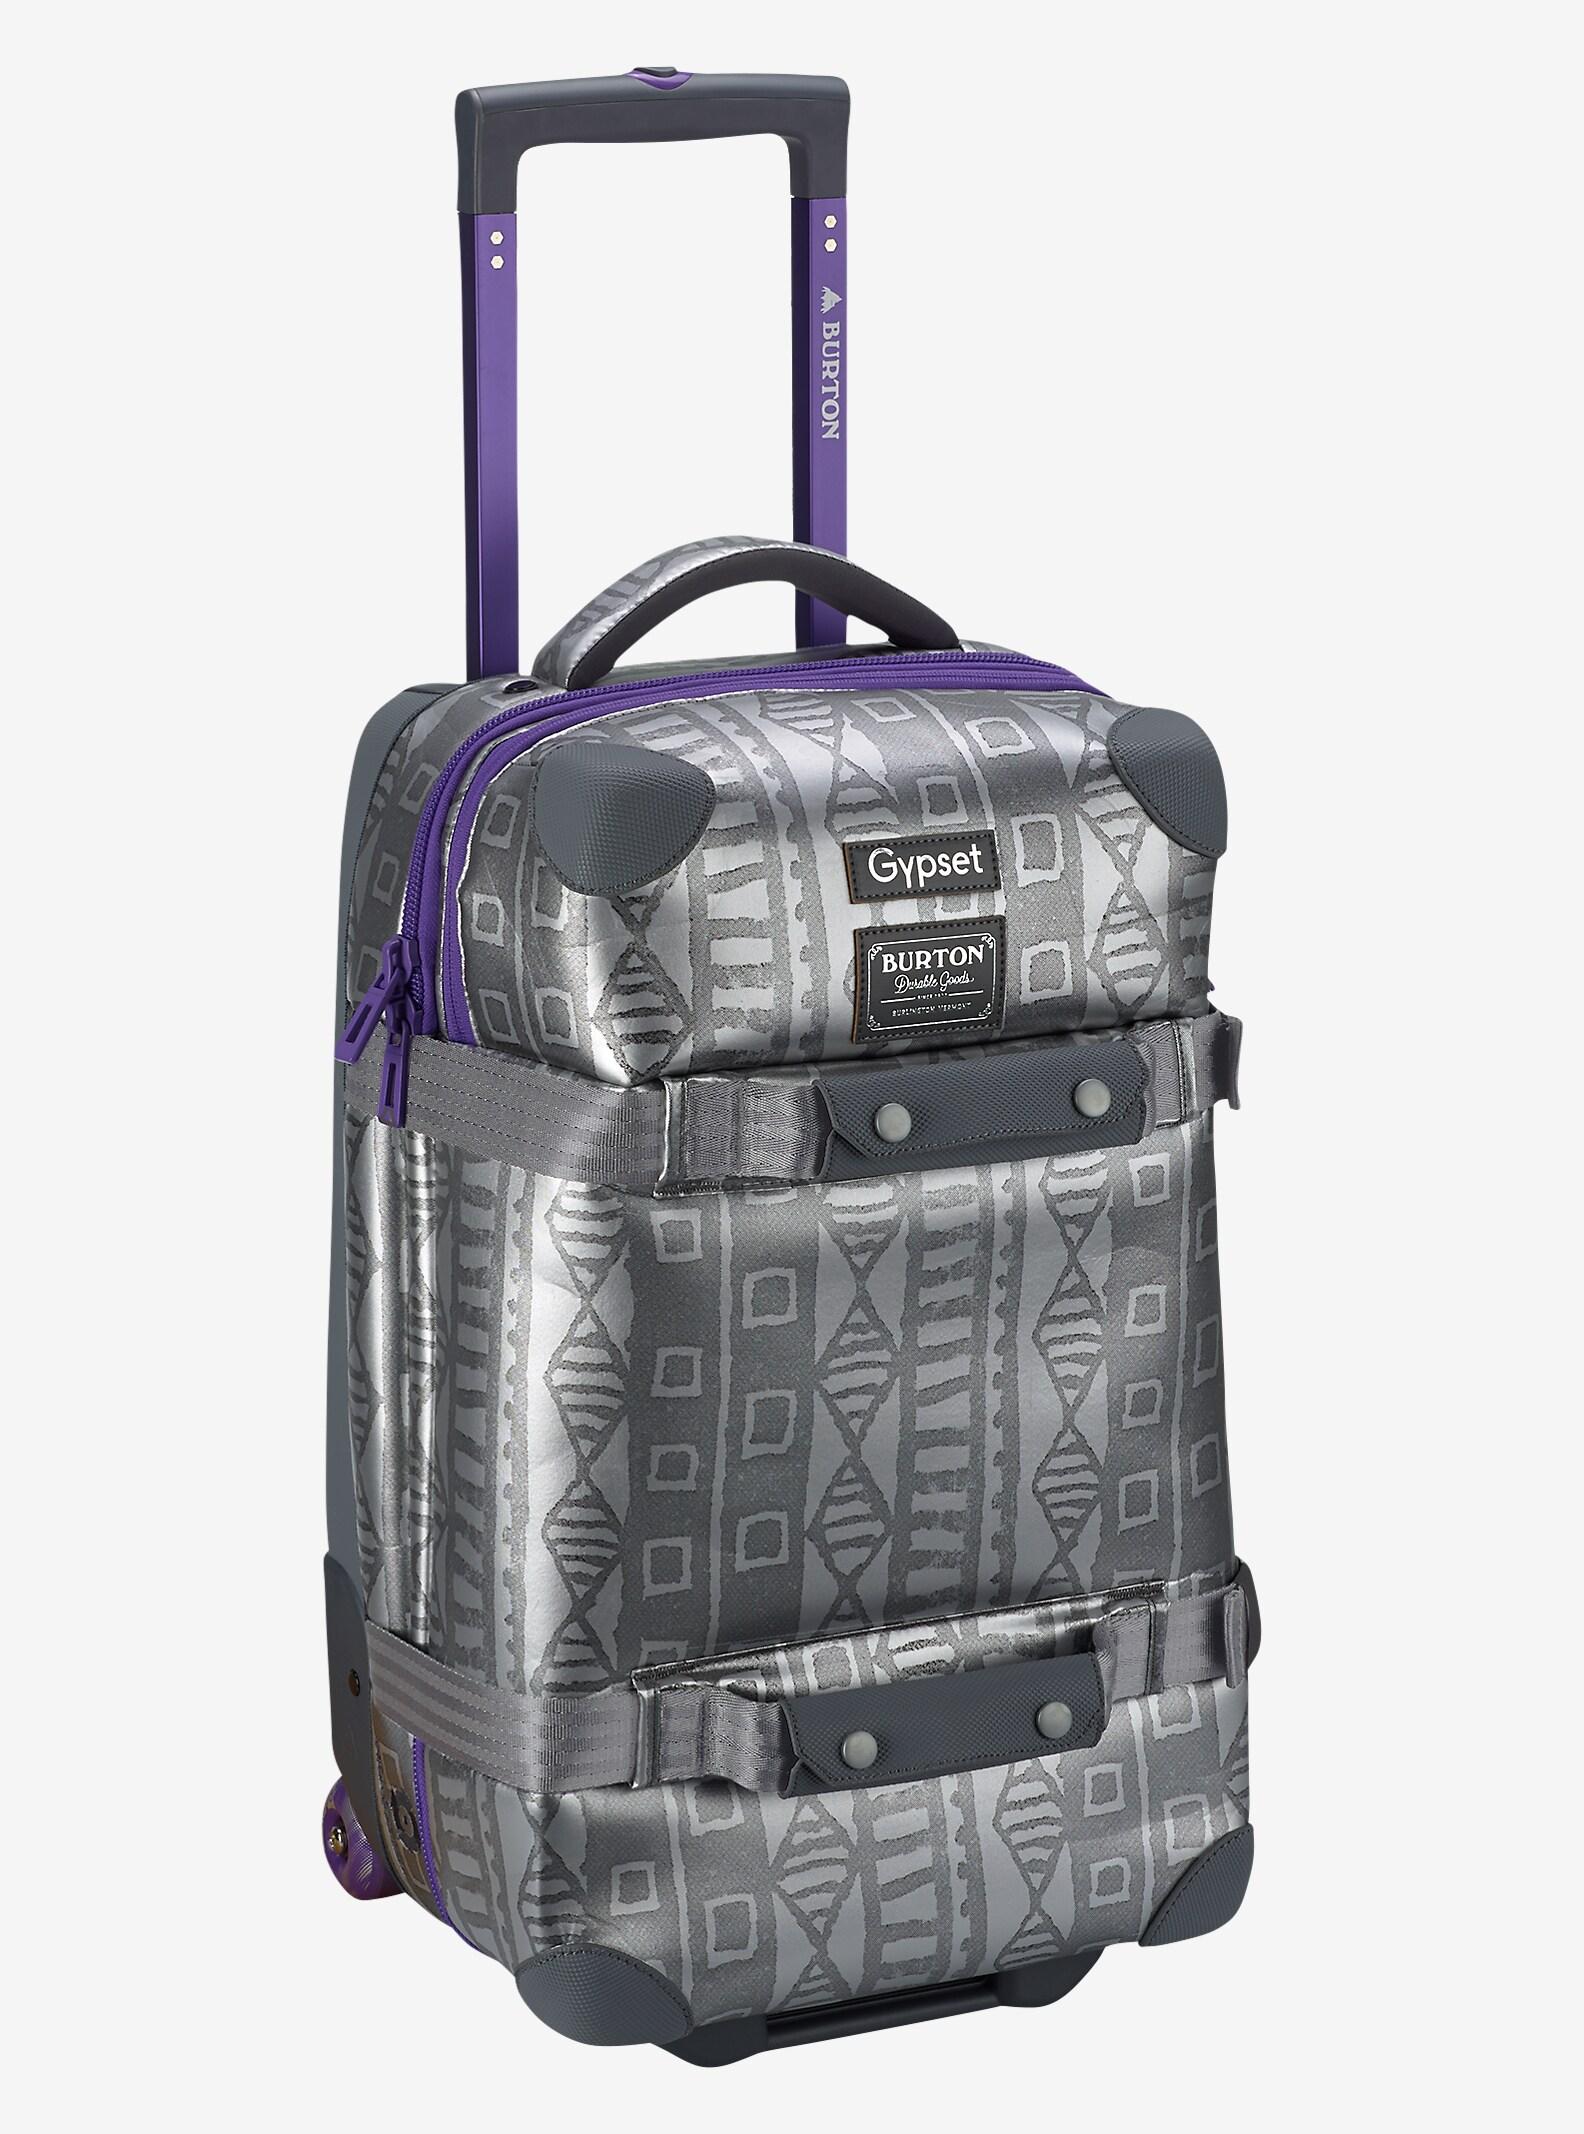 Burton x Gypset Wheelie Flight Deck Travel Bag shown in Galactic Mudcloth